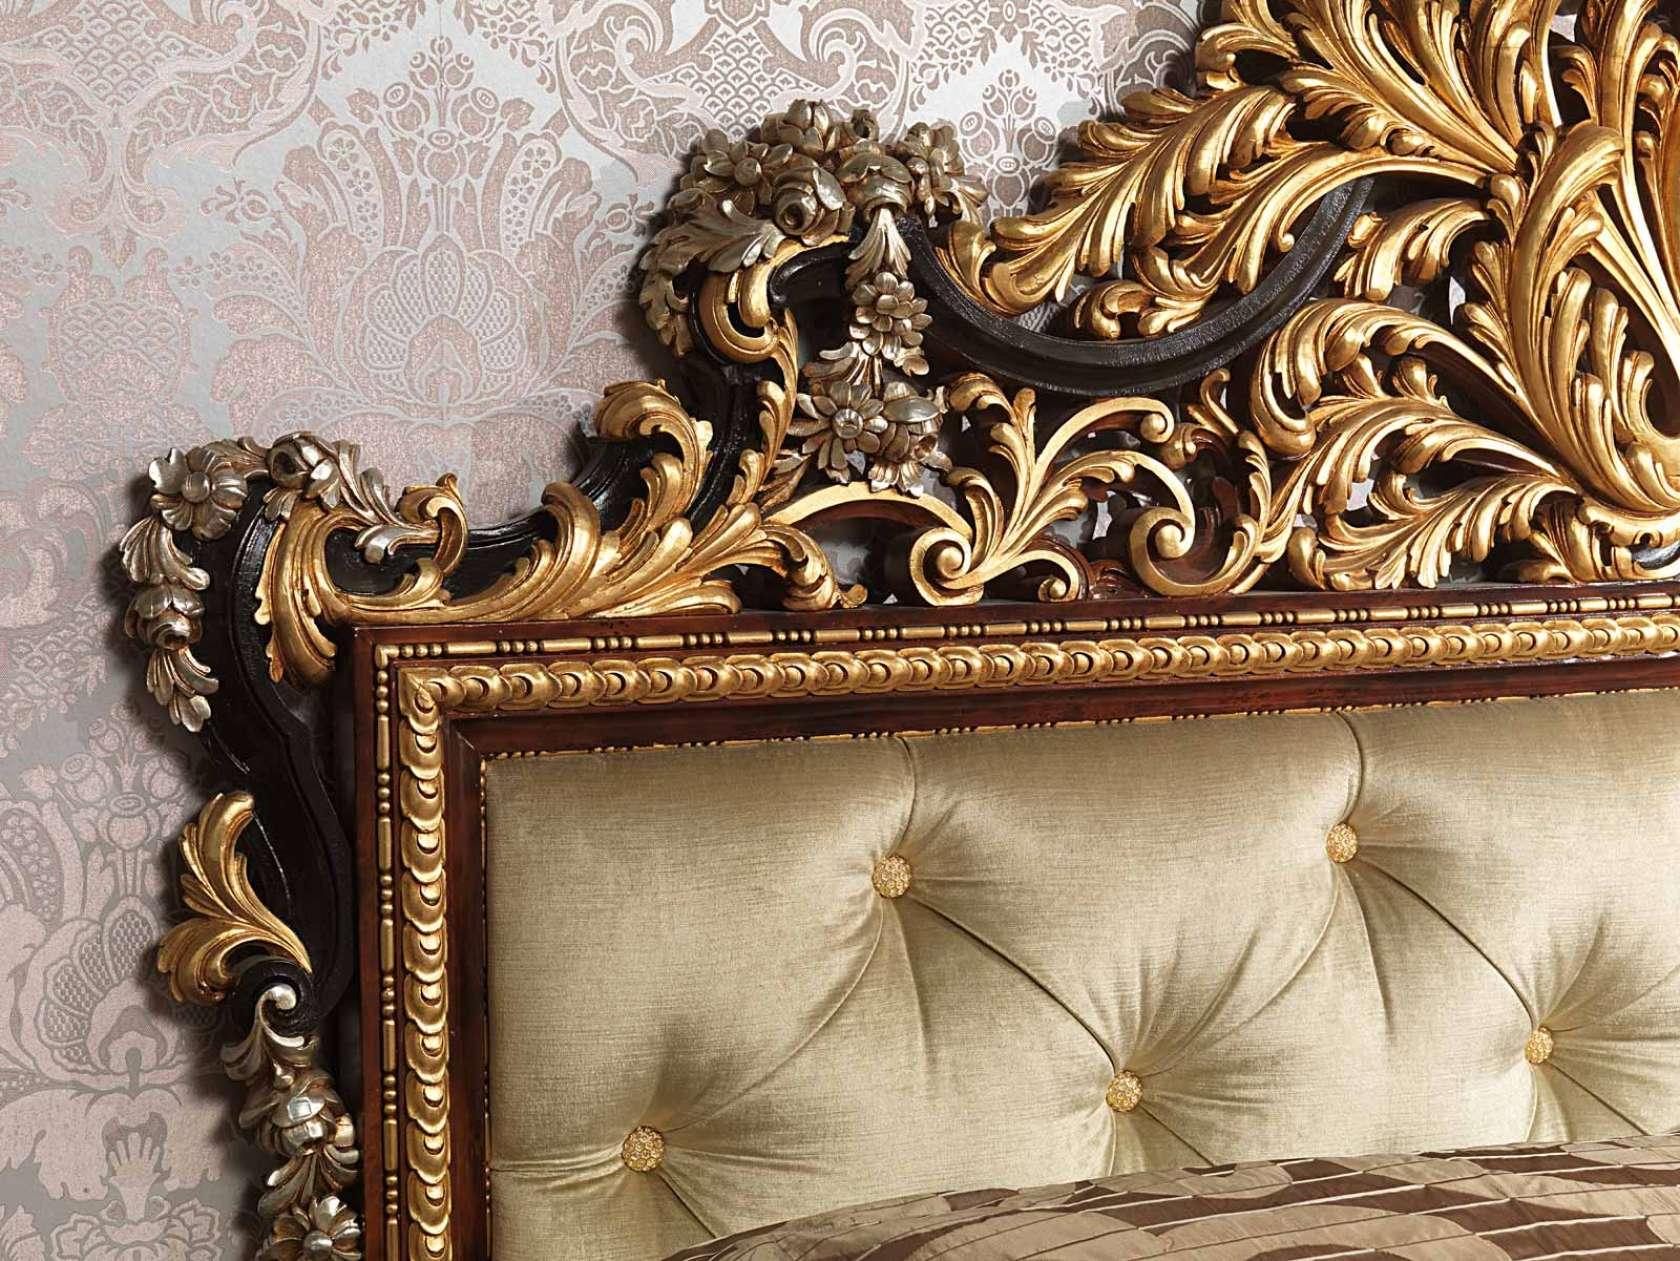 louis xv bedroom furniture  cukjatidesign, Bedroom decor